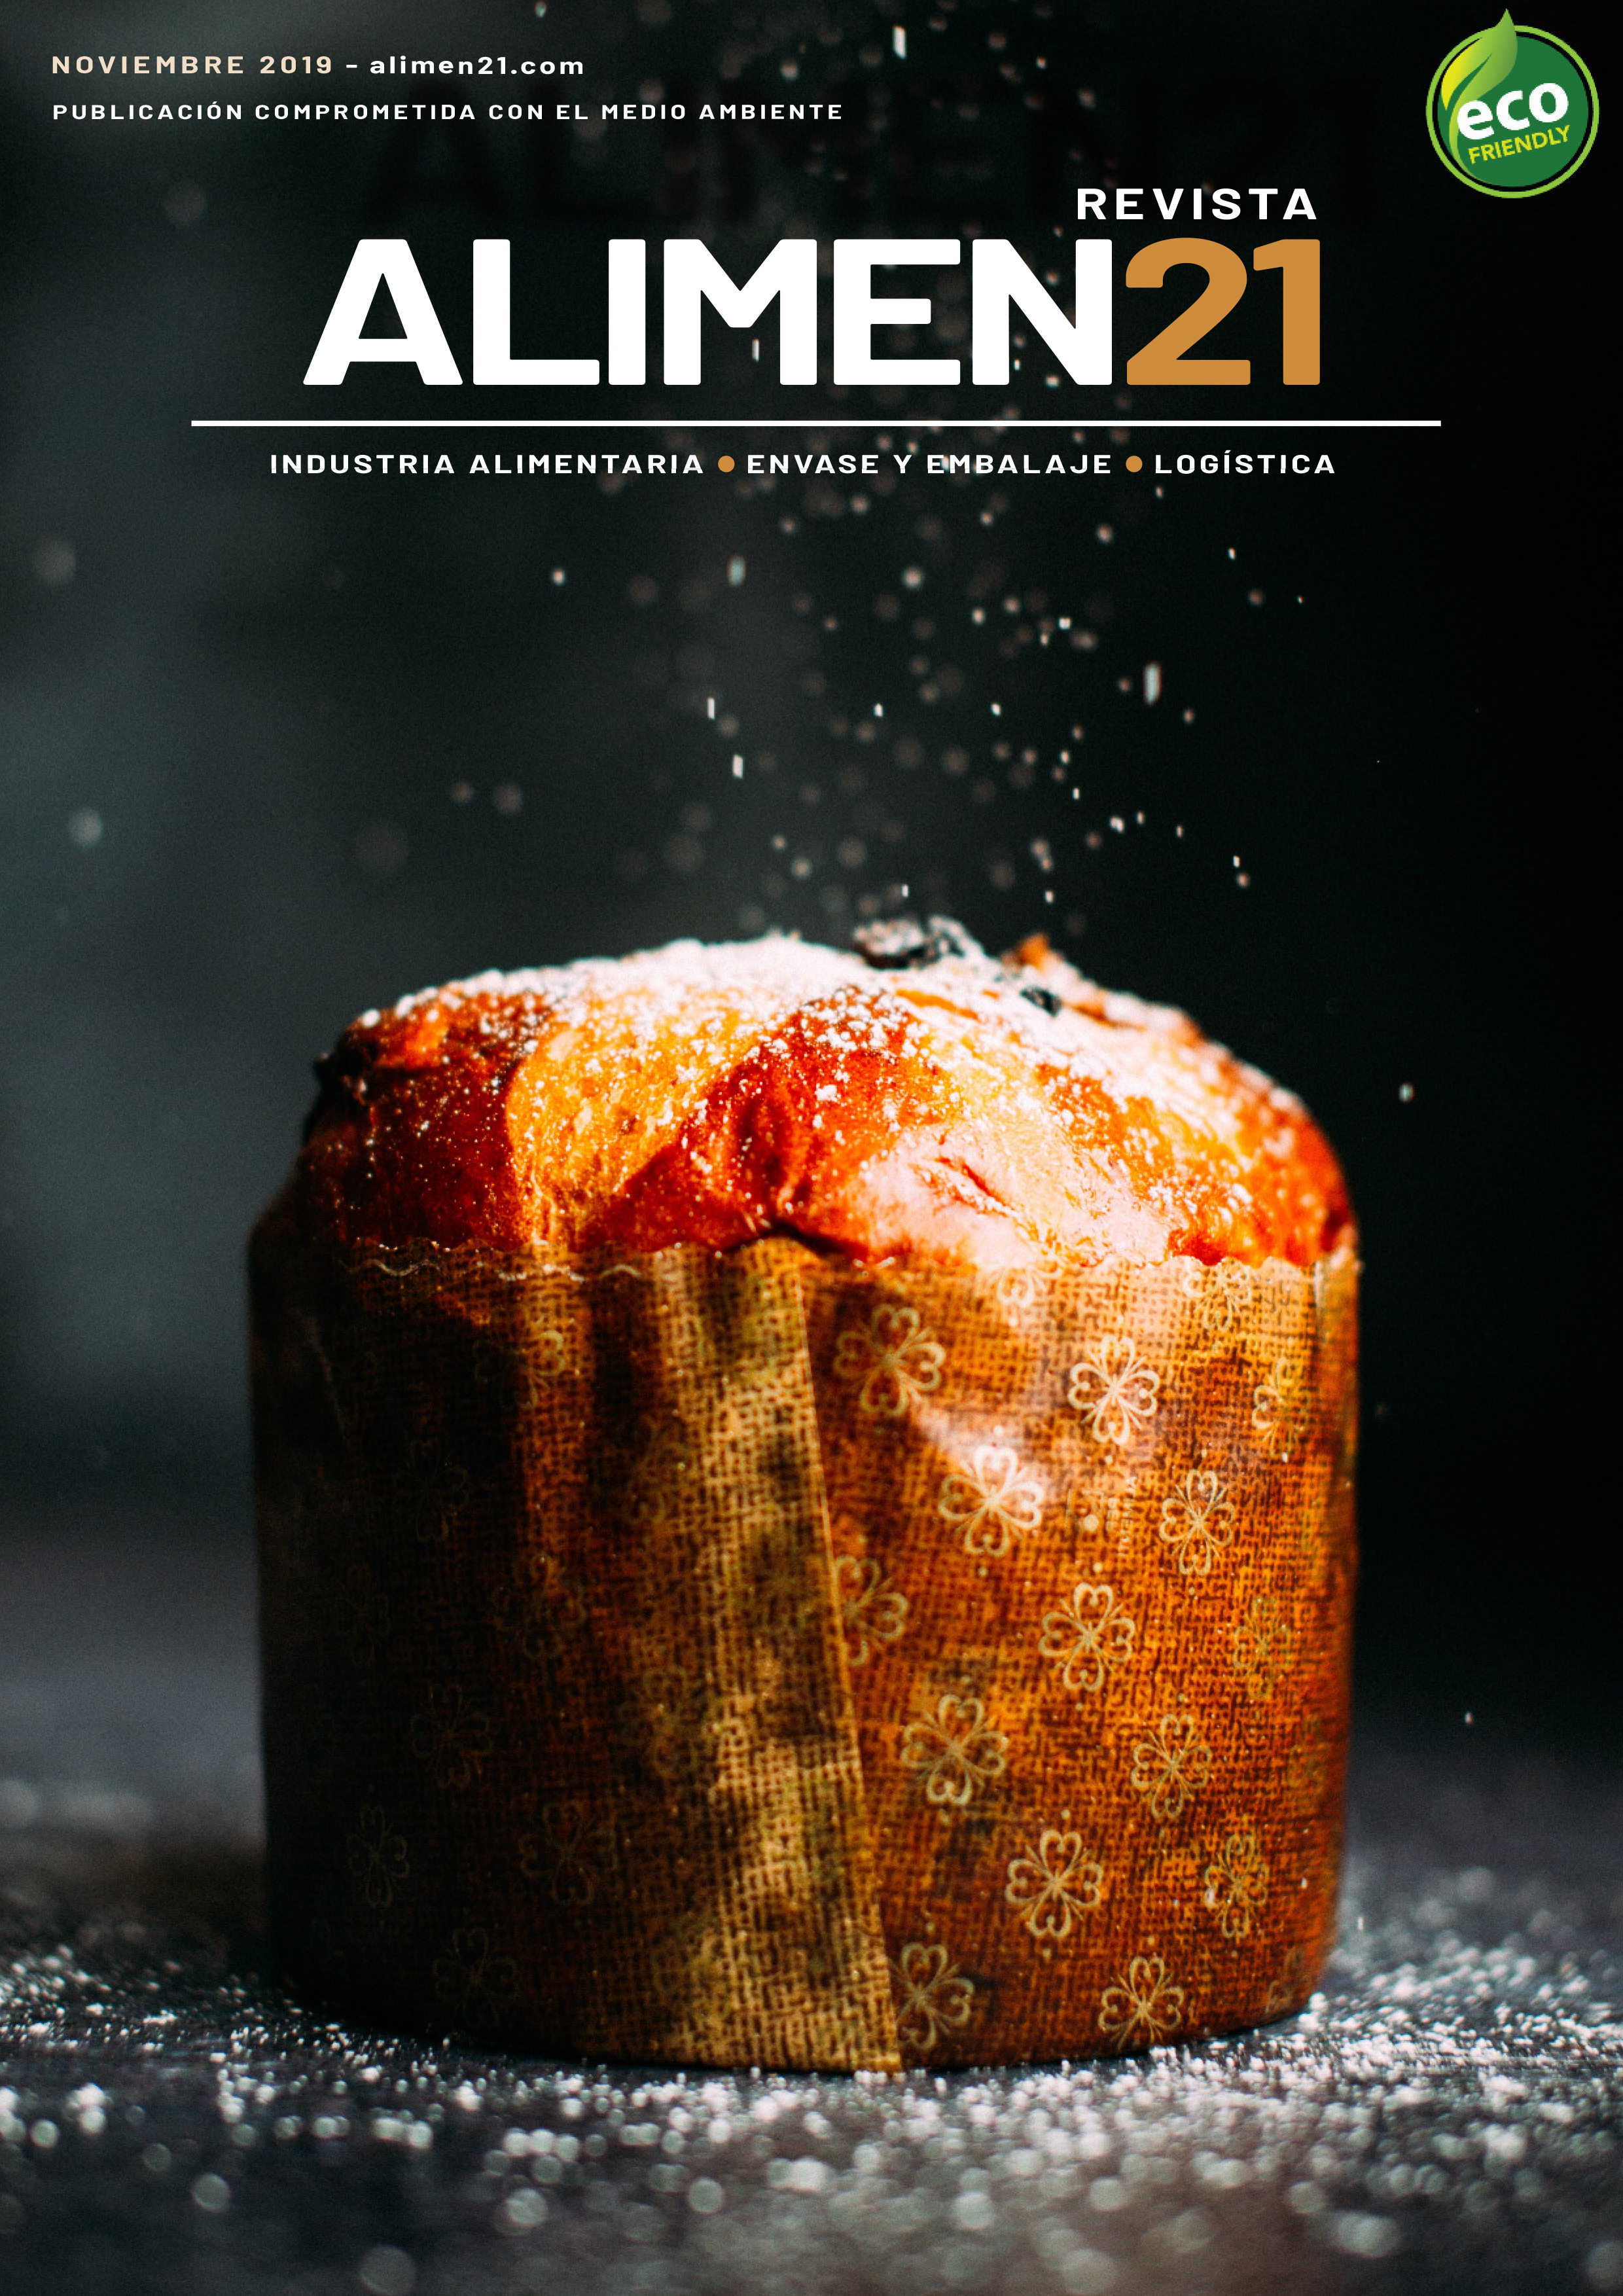 Alimen21 Noviembre 19